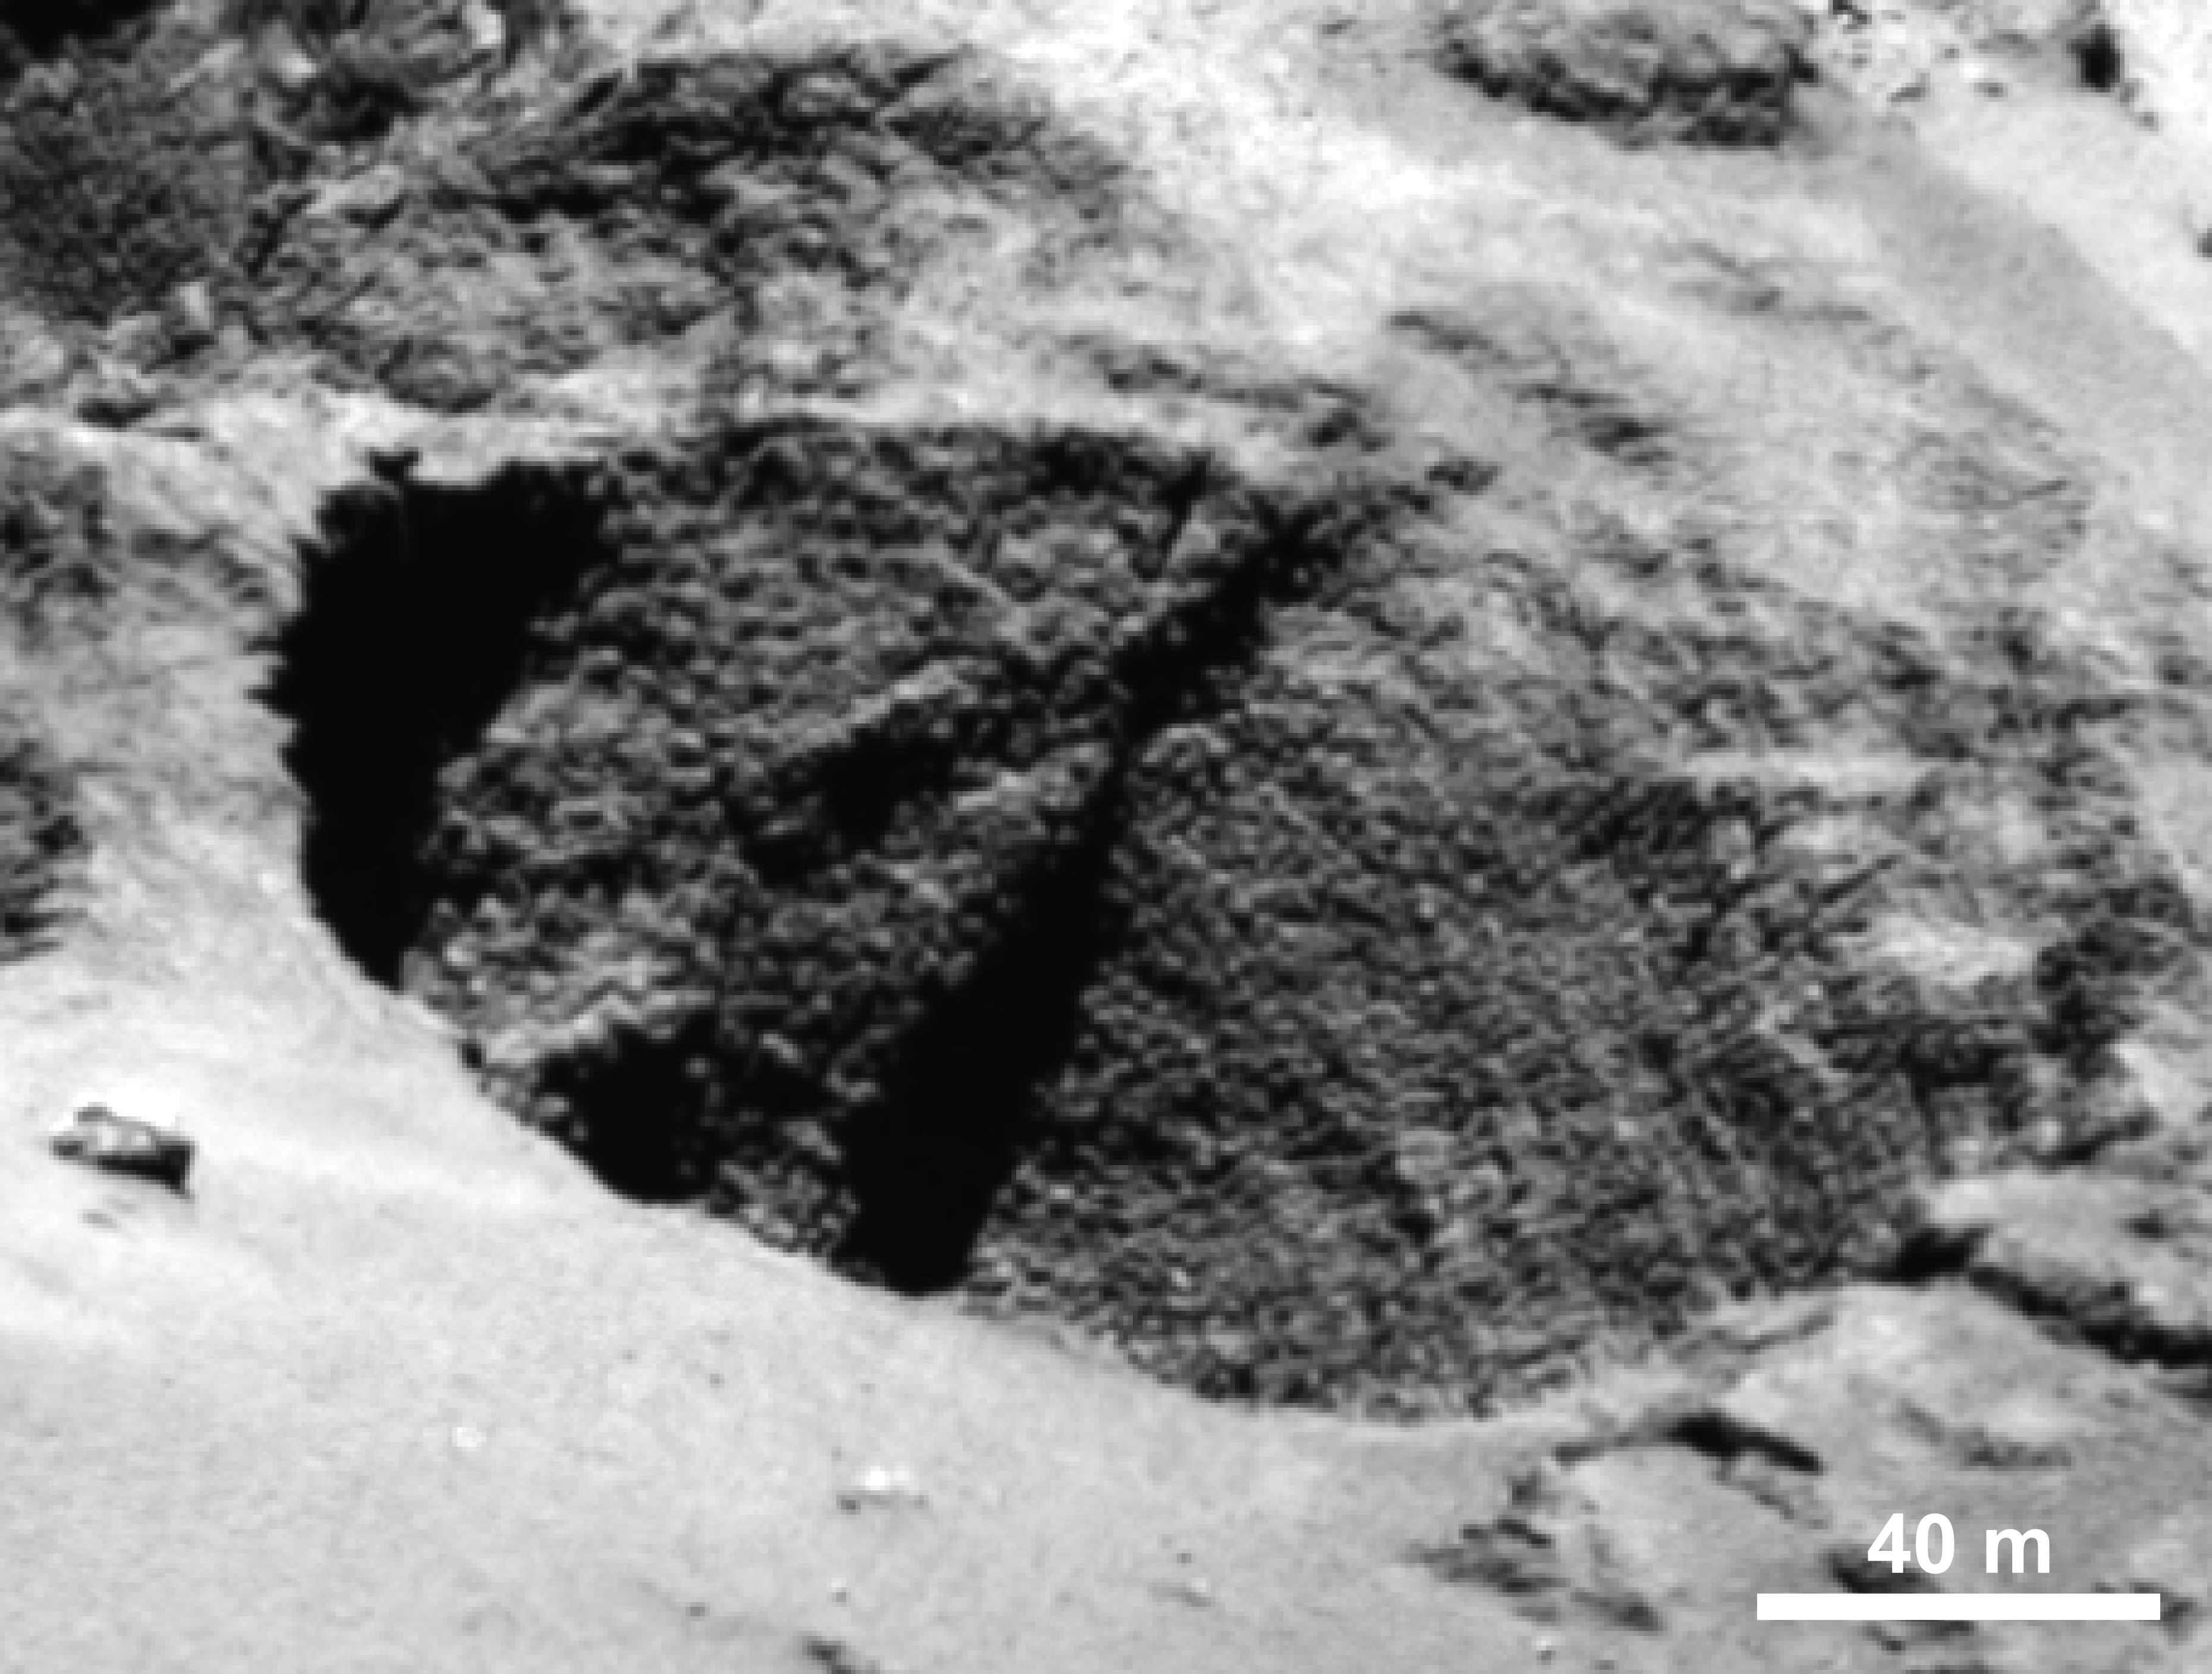 1567215771795-ESA_Rosetta_67P_OSIRIS_NAC_goosebumps_a.png